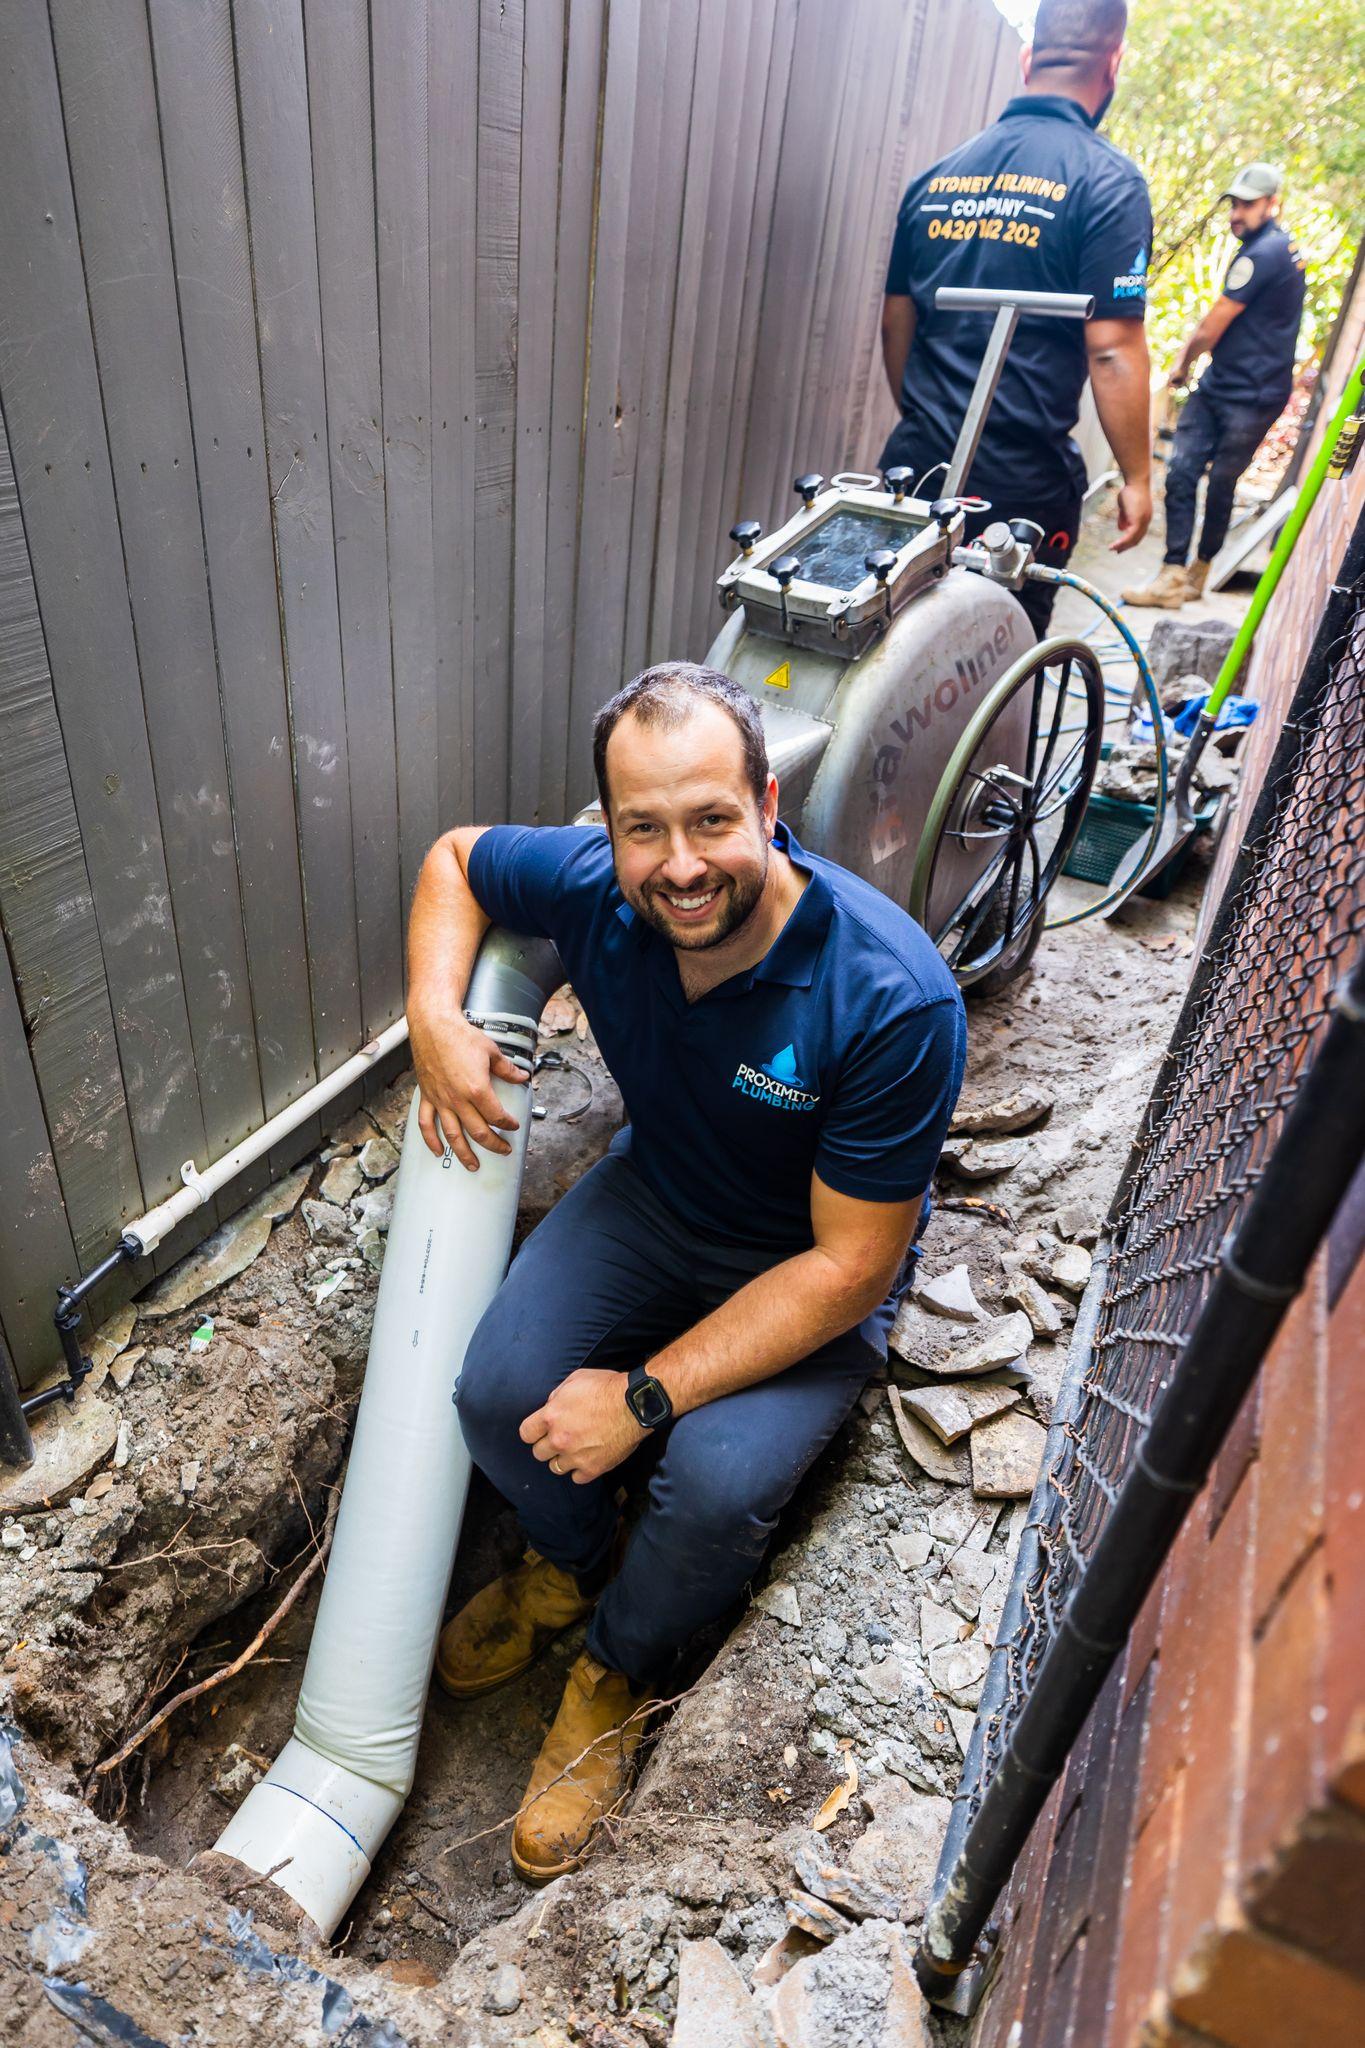 https://proximityplumbing.com.au/wp-content/uploads/2020/12/Sydney-Relining-Company.jpg